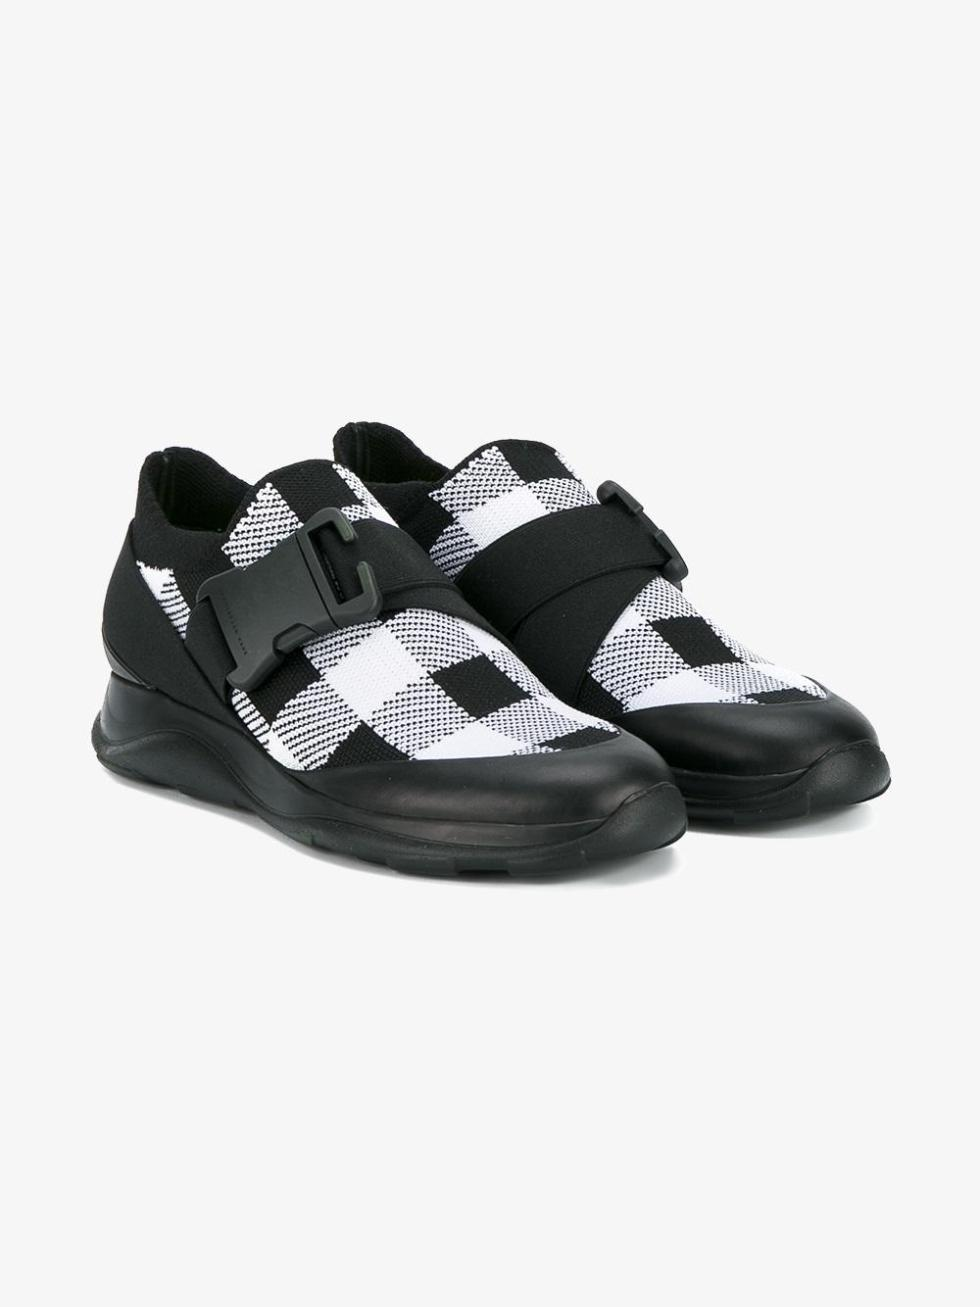 Christopher Kane gingham sneakers